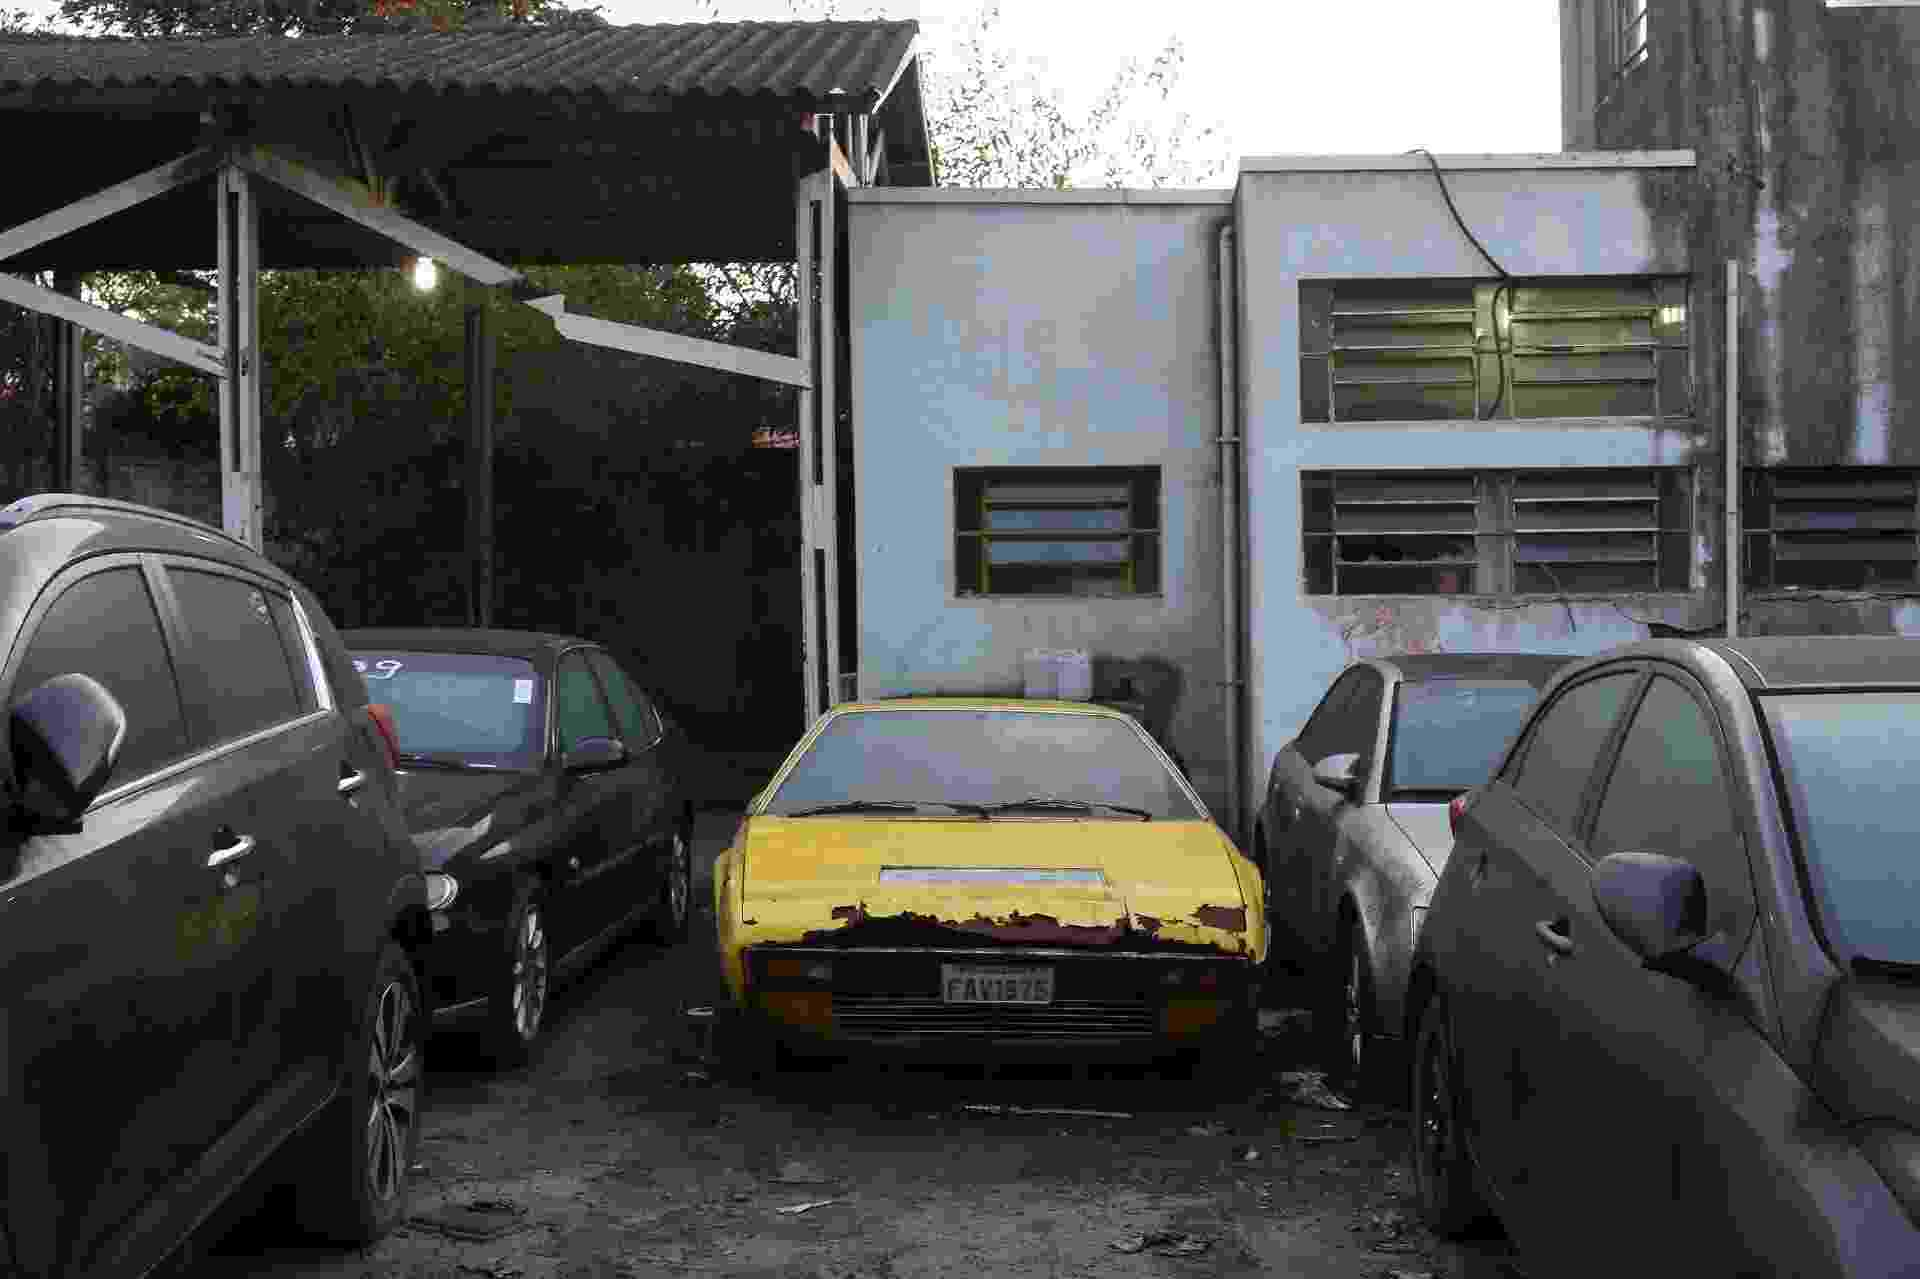 Ferrari Dino 208 GT4 apodrece enferruja pátio Prefeitura Santo André sucata única no Brasil - Amanda Perobelli/UOL